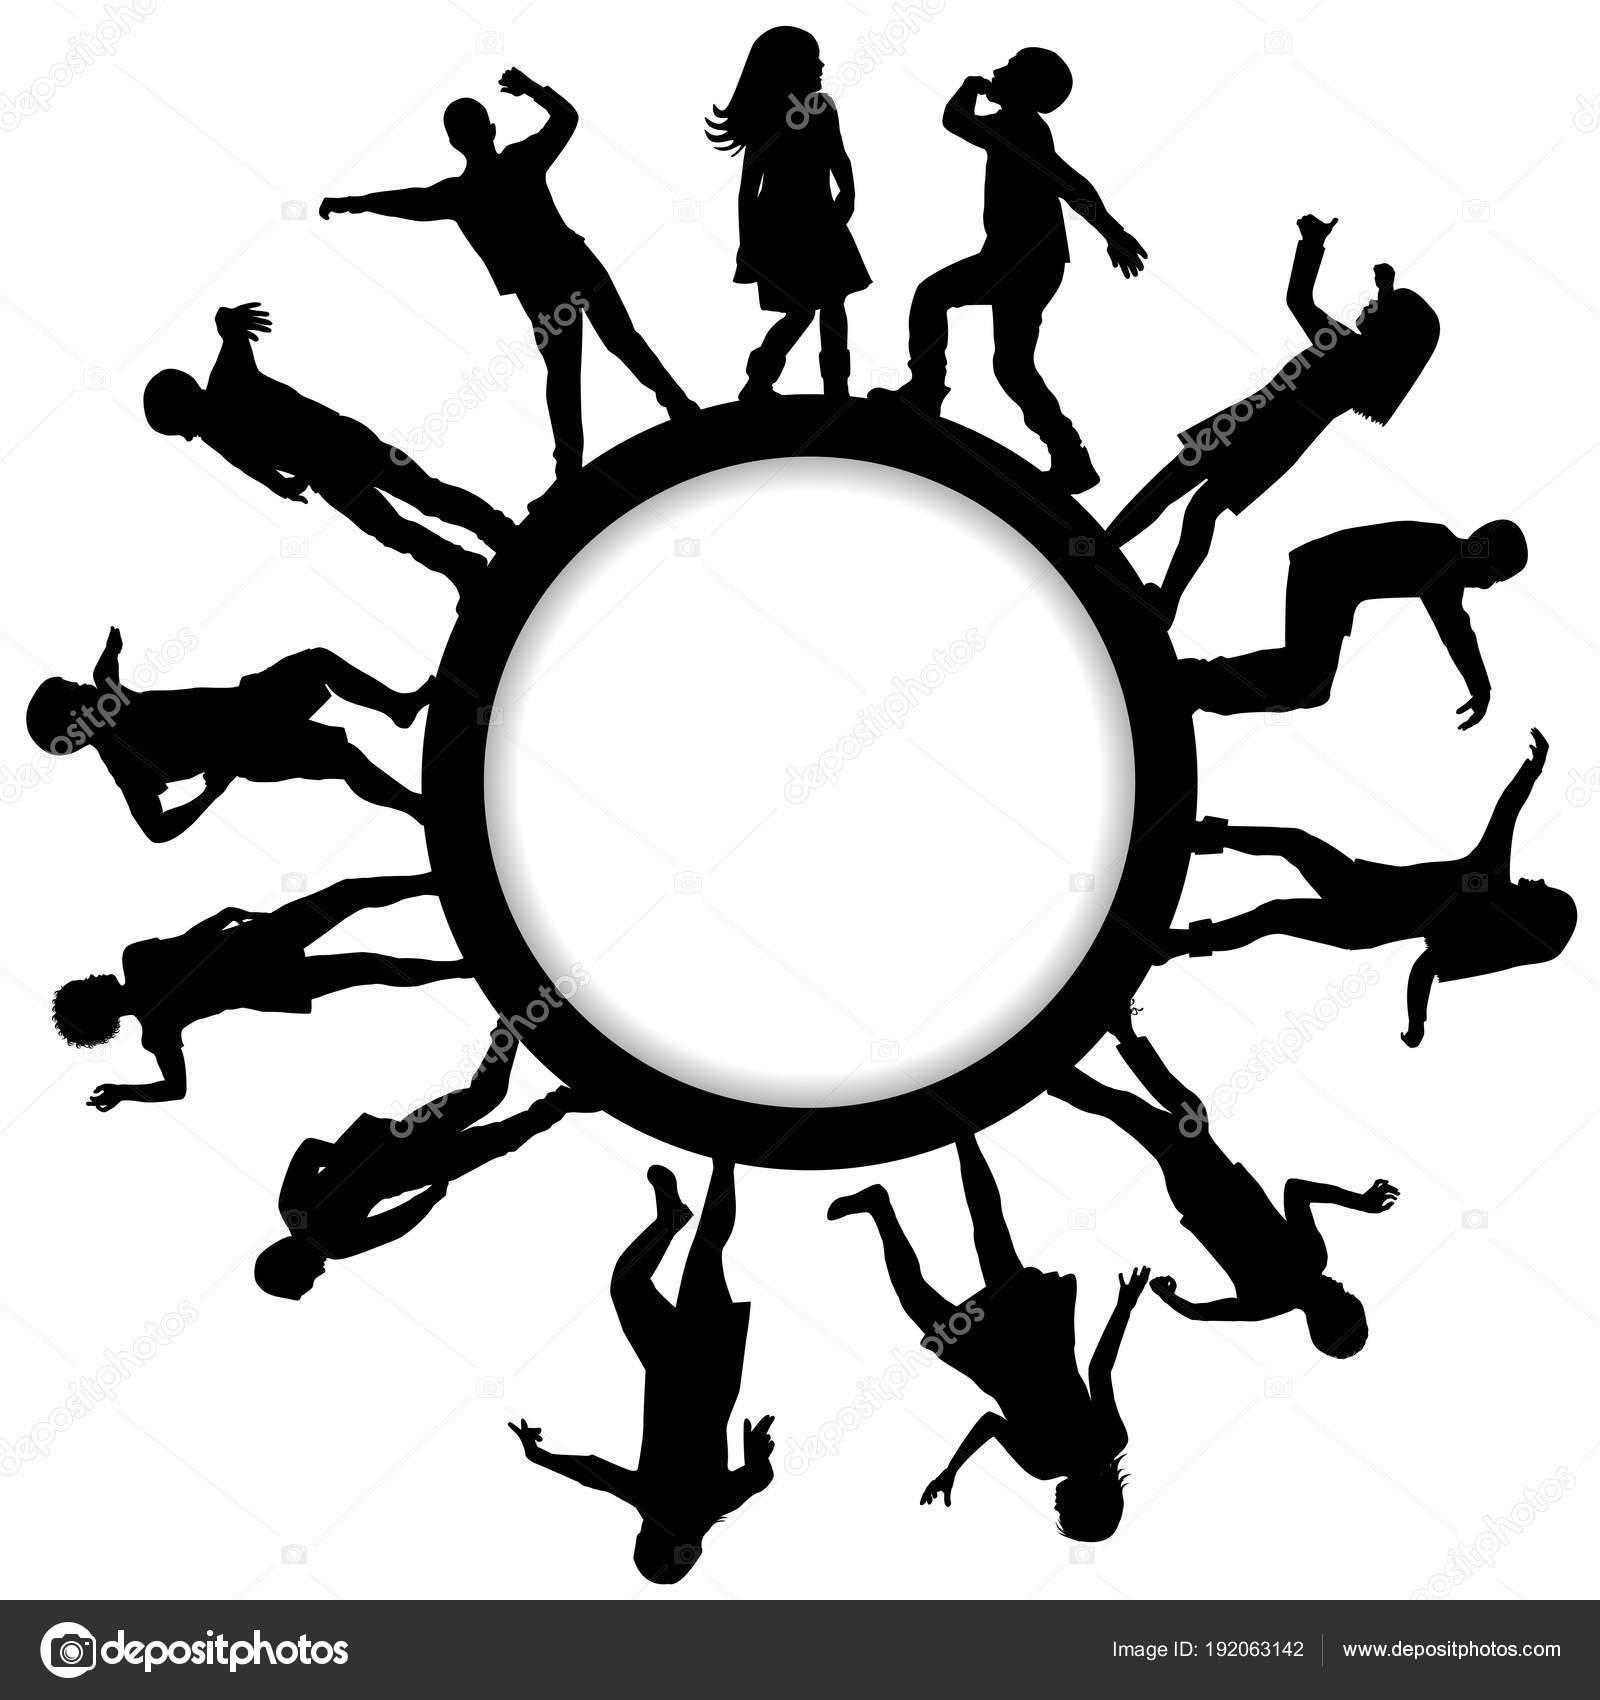 Kreis-Rahmen mit Kinder-Silhouetten, tanzen — Stockvektor ...